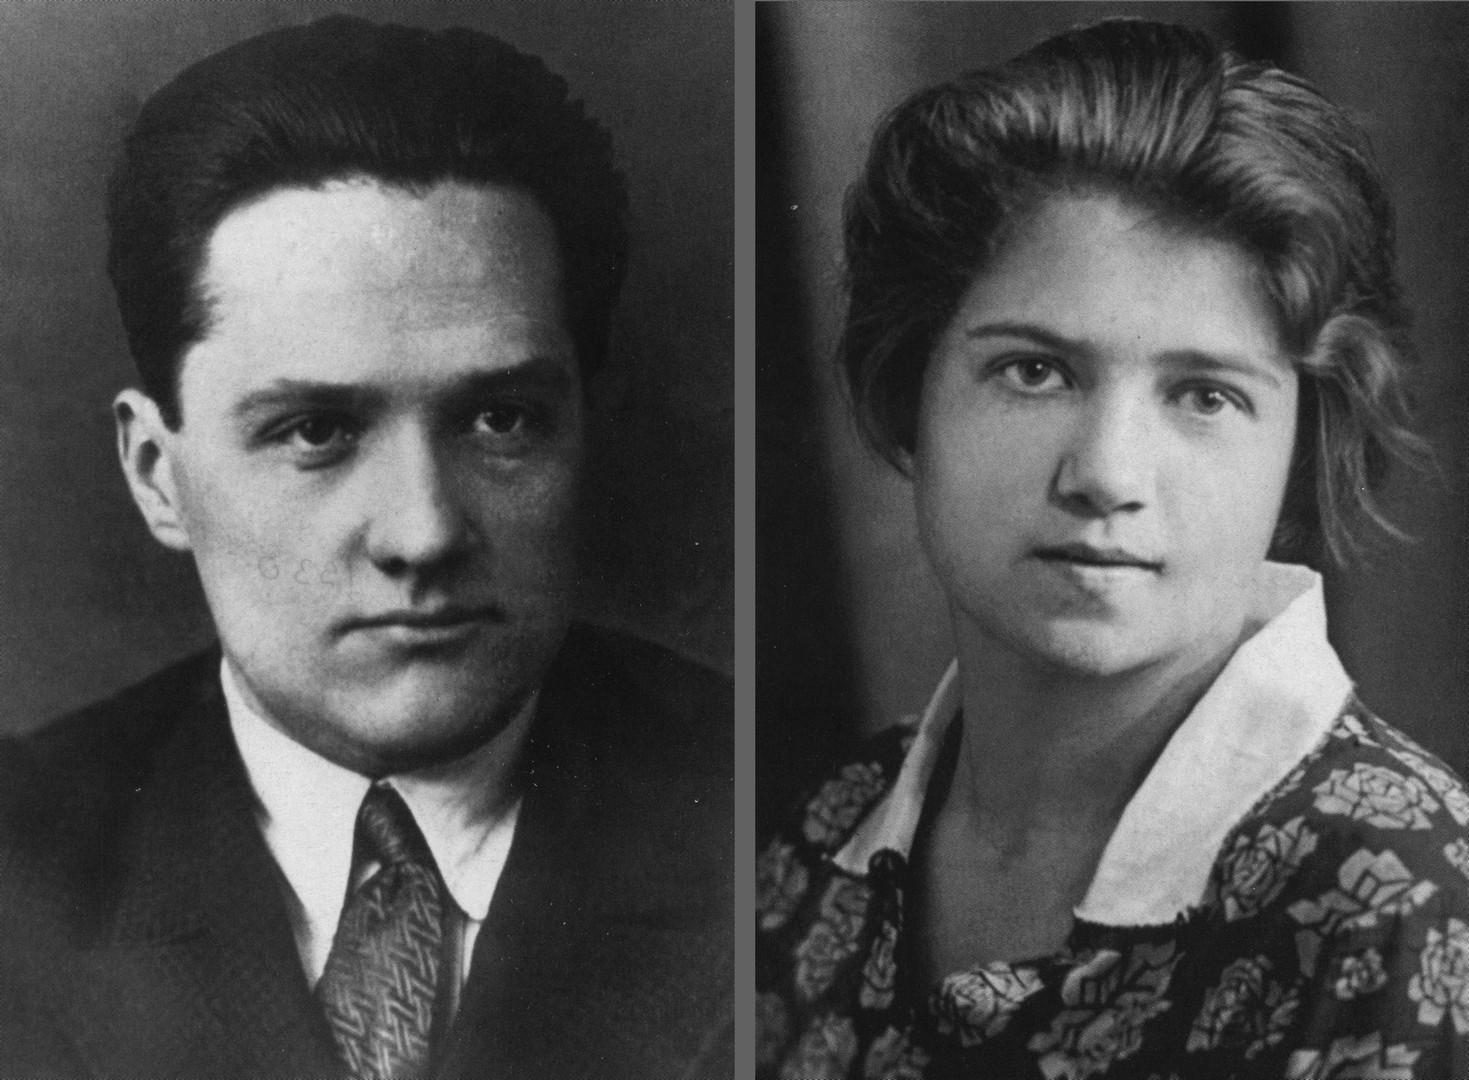 Николай и Антонина. 18.04.1934 г.